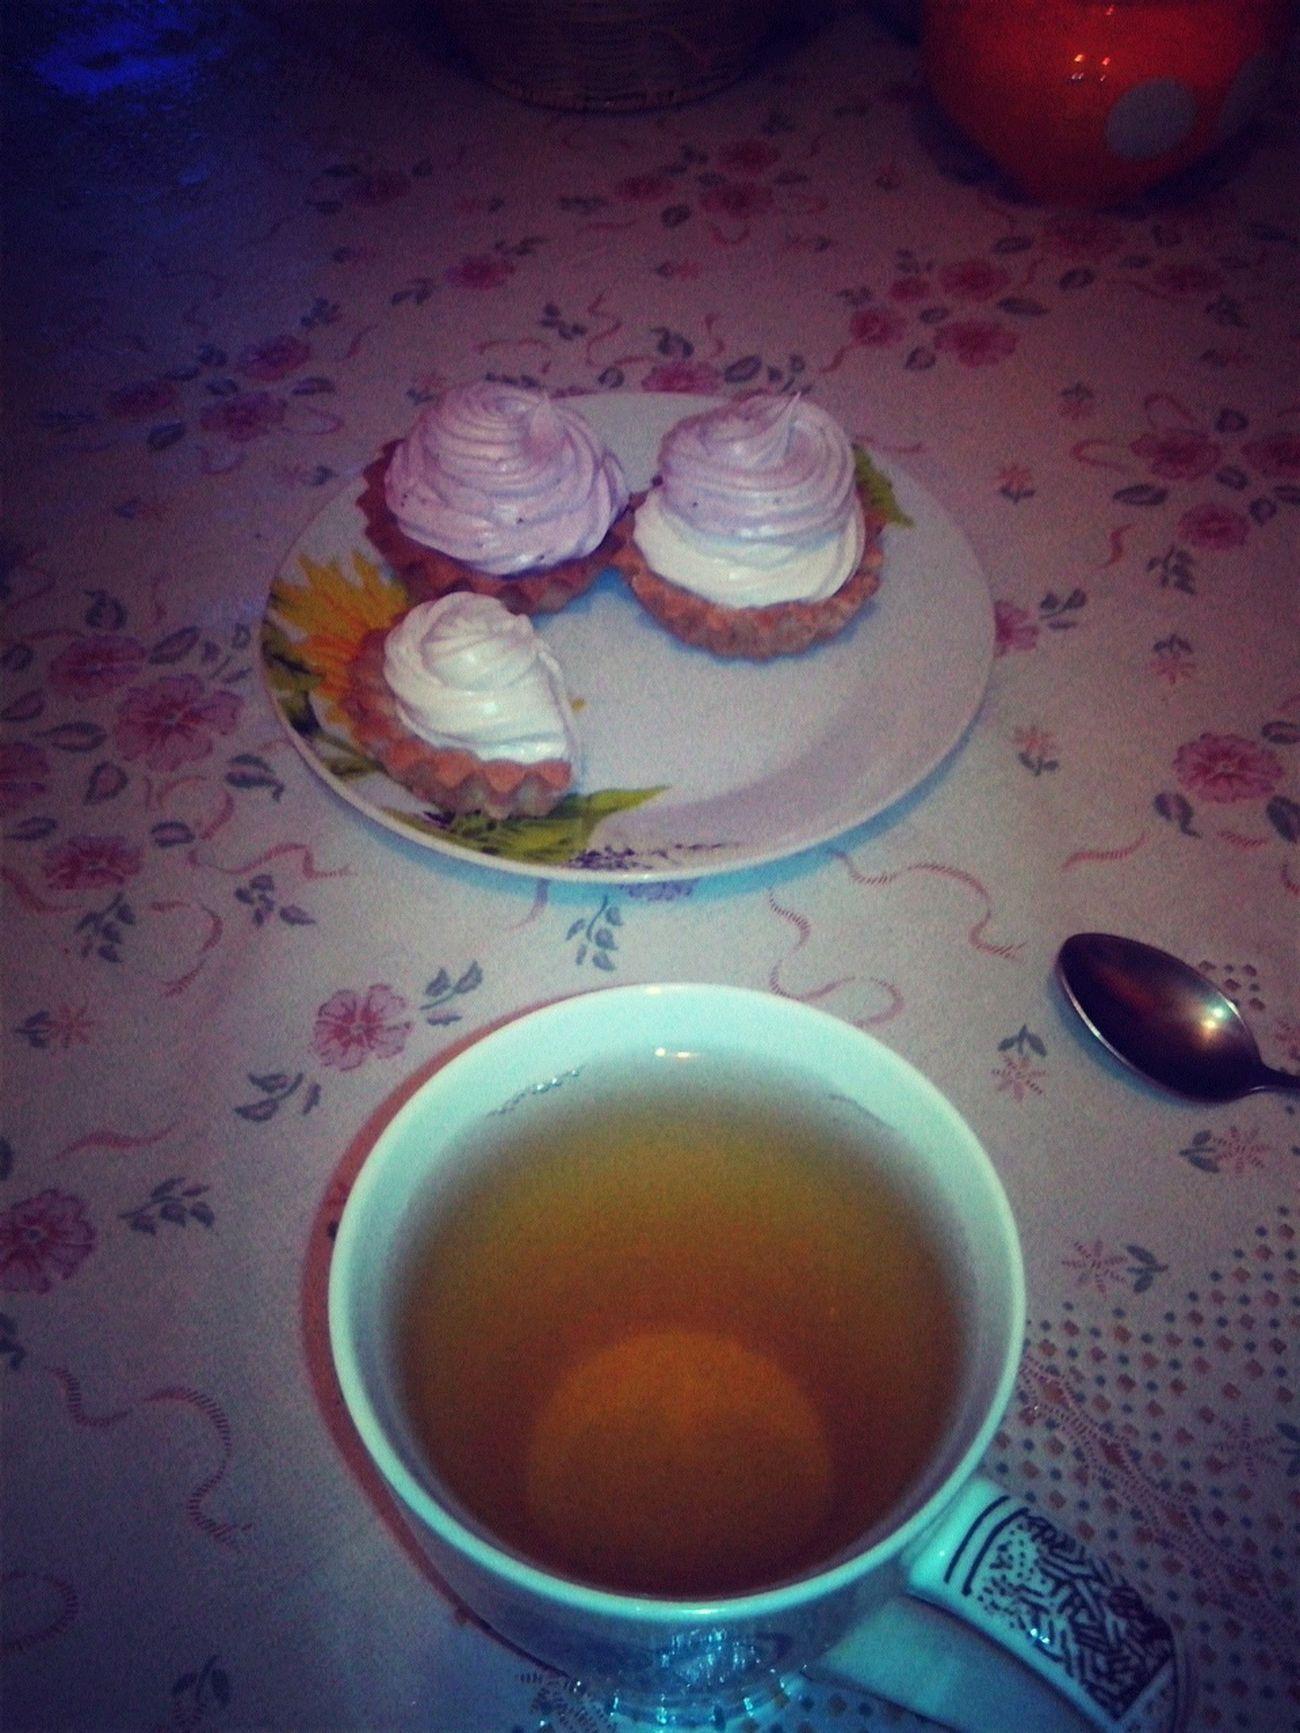 Cake♥ Cream Вкусняшка пирожное